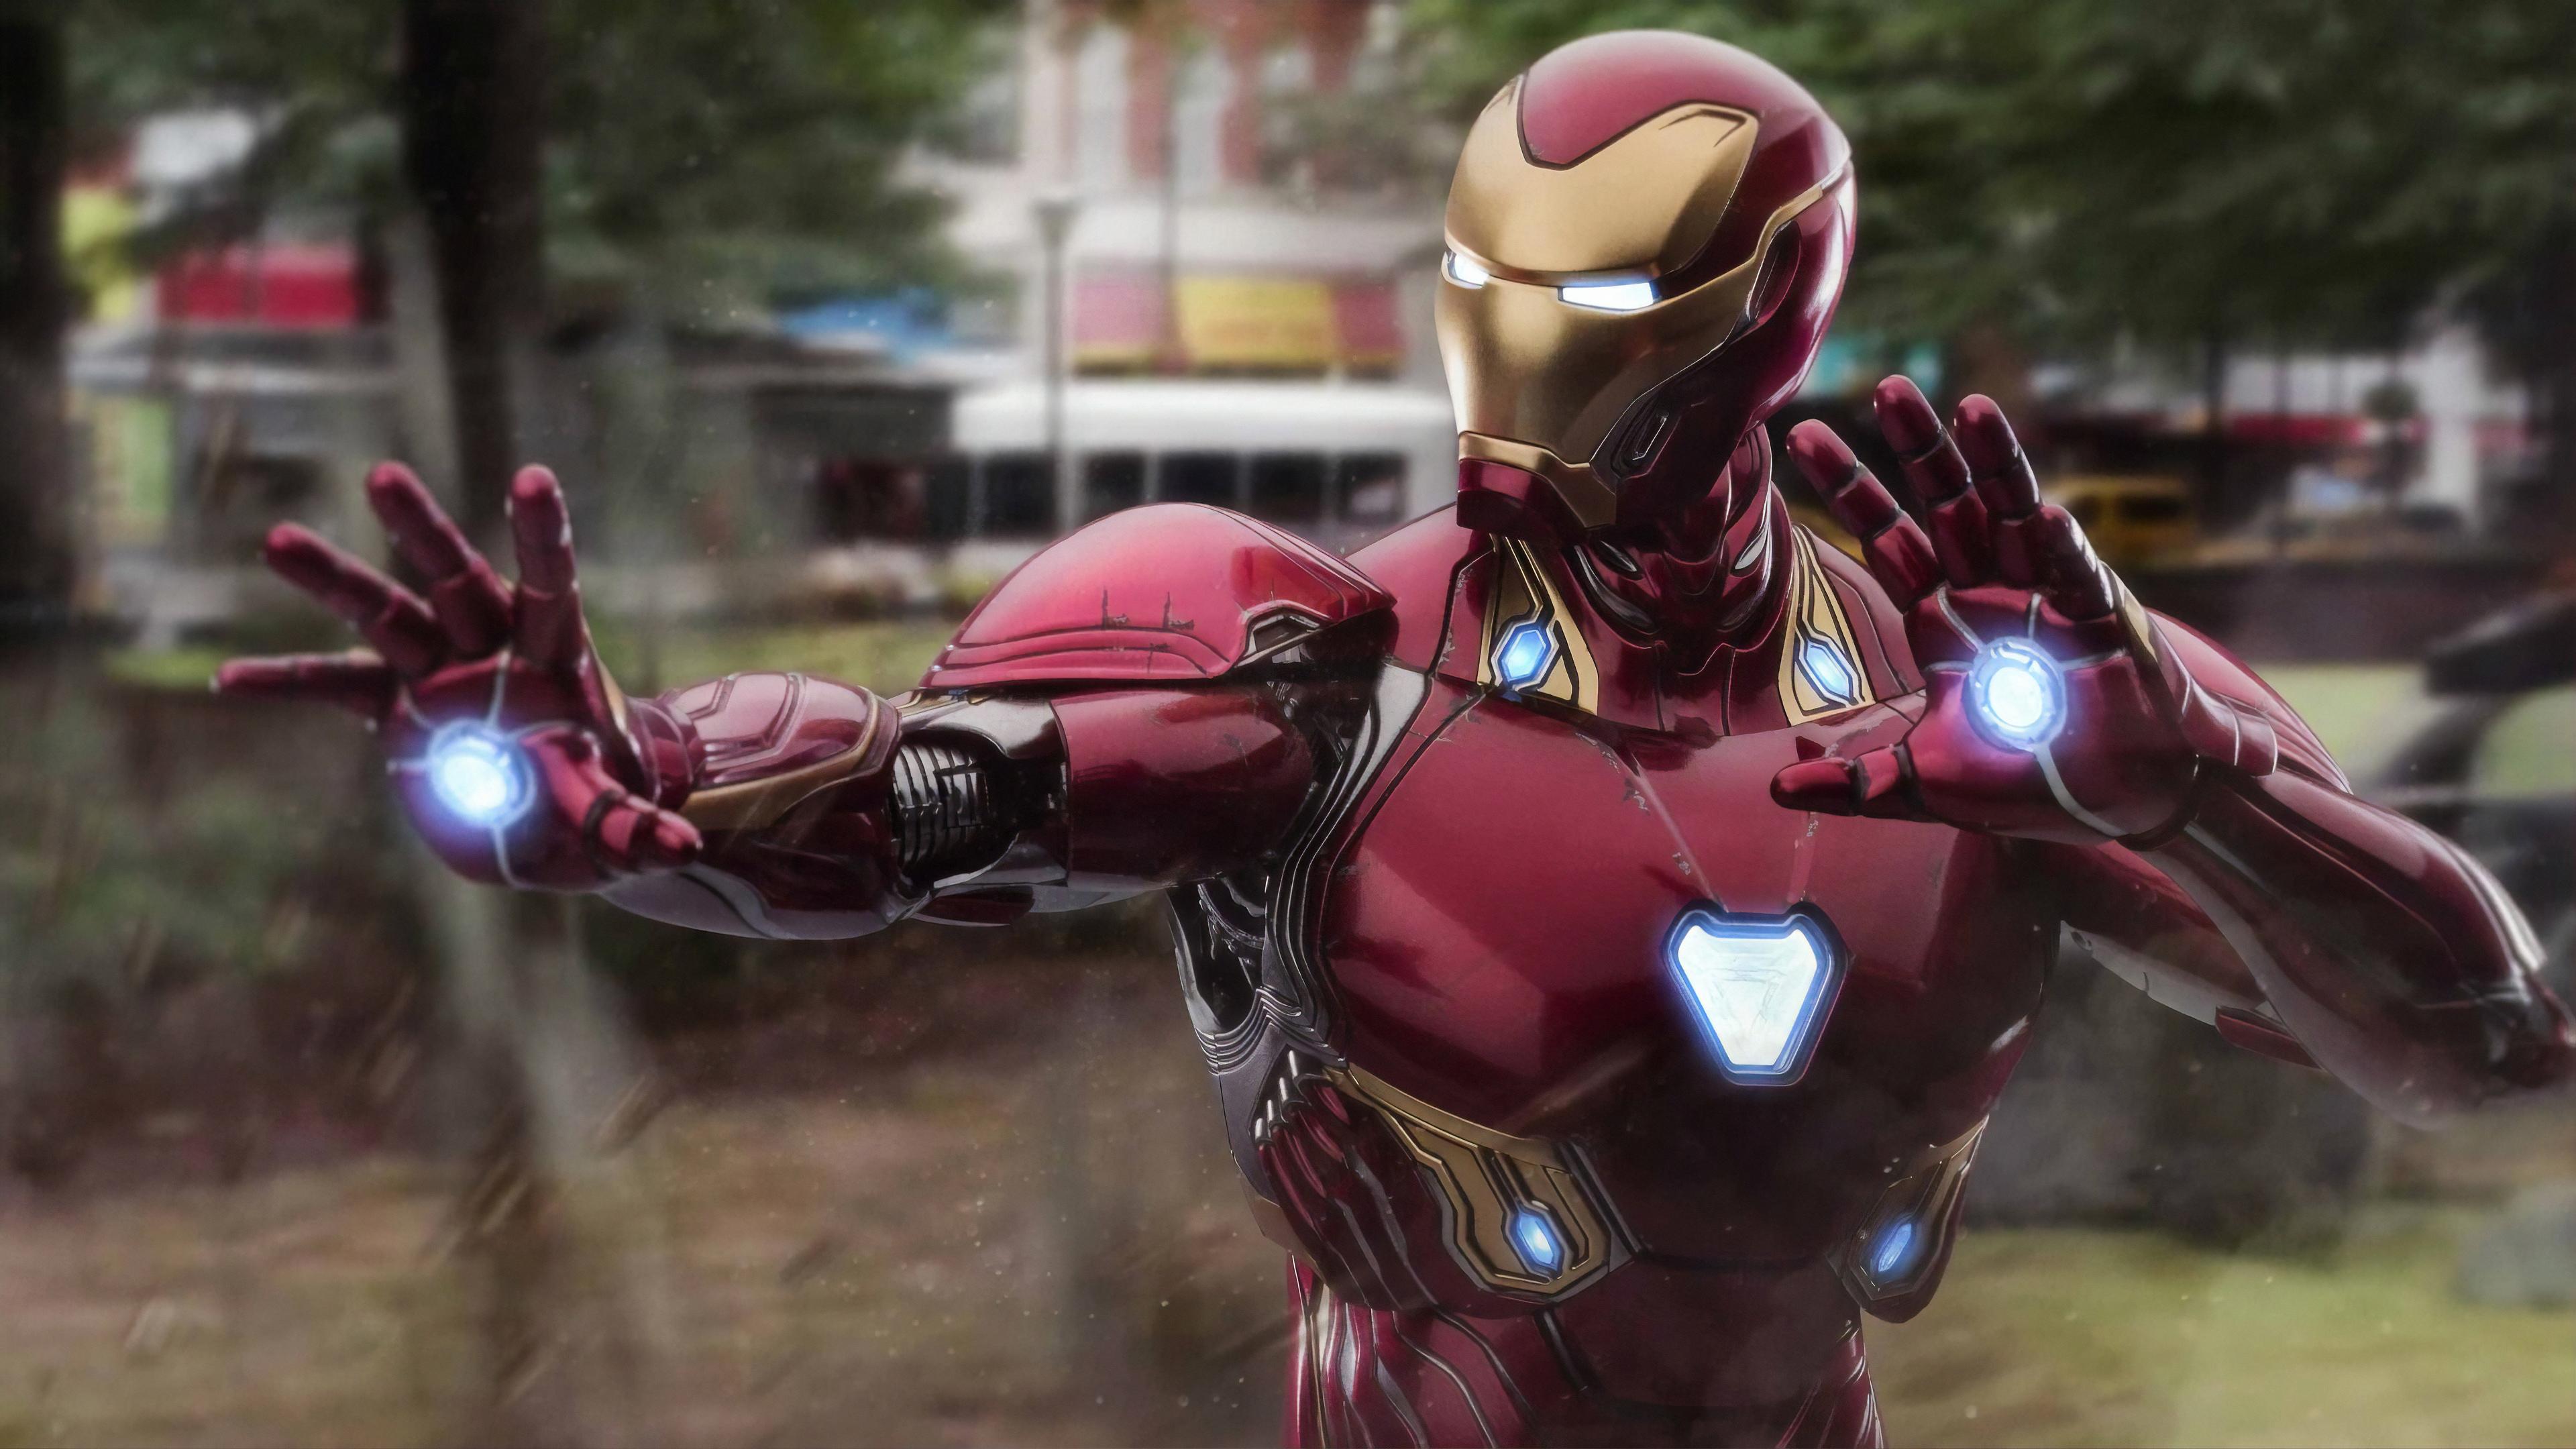 iron man infinity war new 1565053703 - Iron Man Infinity War New - superheroes wallpapers, iron man wallpapers, hd-wallpapers, 4k-wallpapers